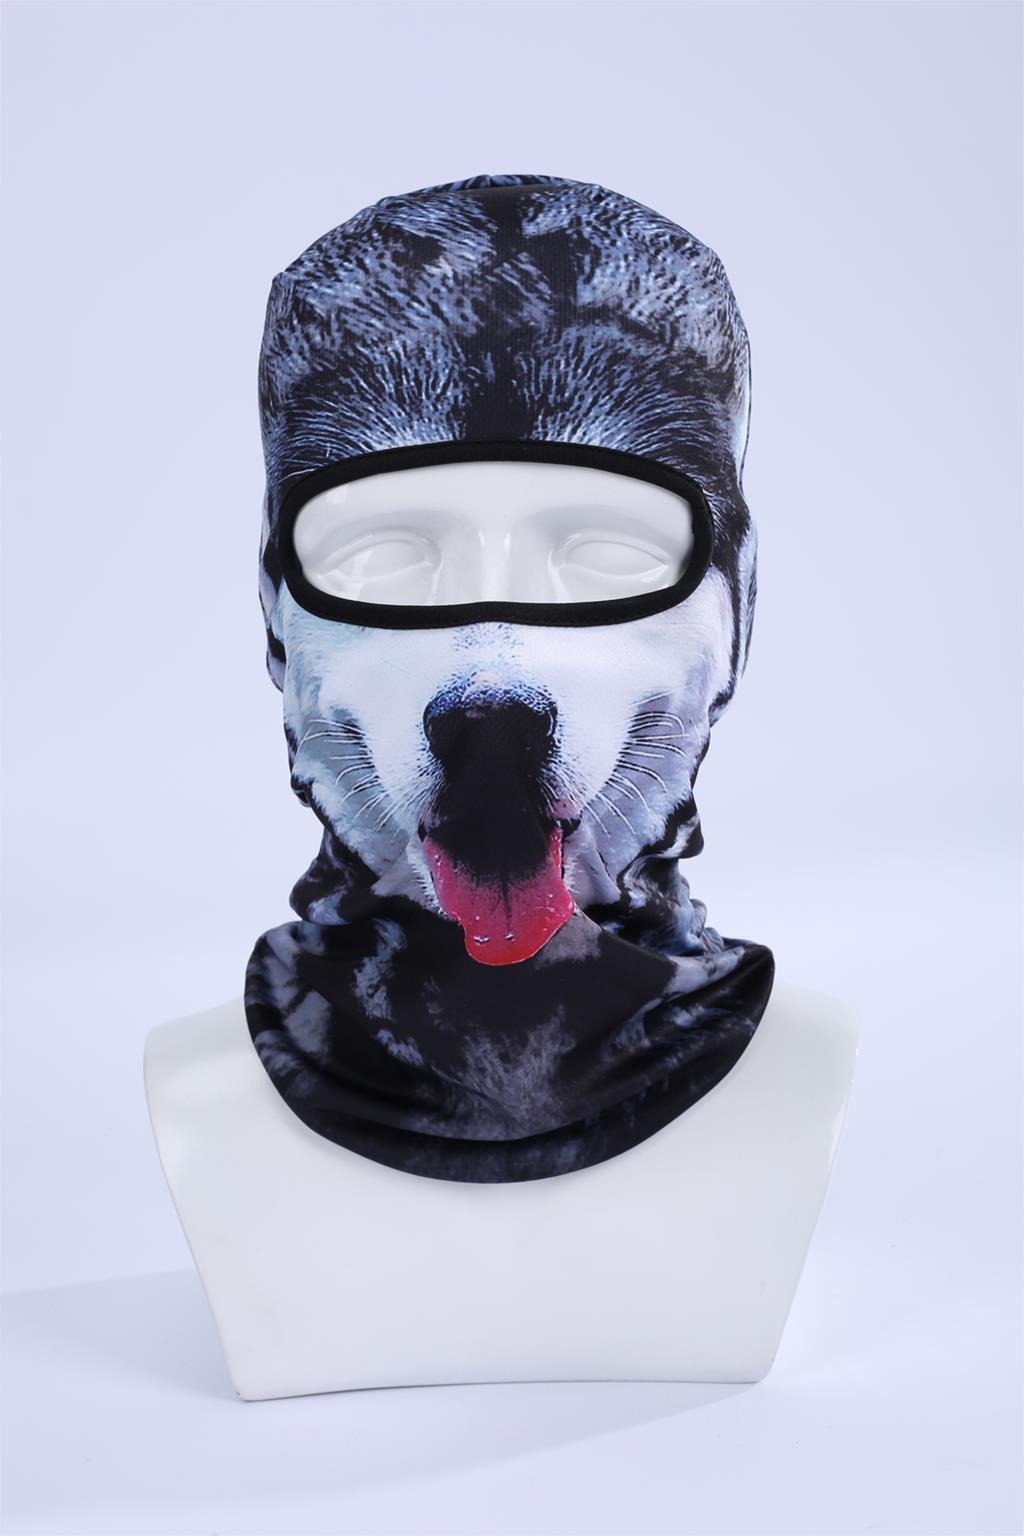 Hot Sale 2017 Cool ! 3d Dog Animal Ski Hood Hat Balaclava Full Face Mask Outdoor Sports Bicycle Cycling Ski Masks Bbb06